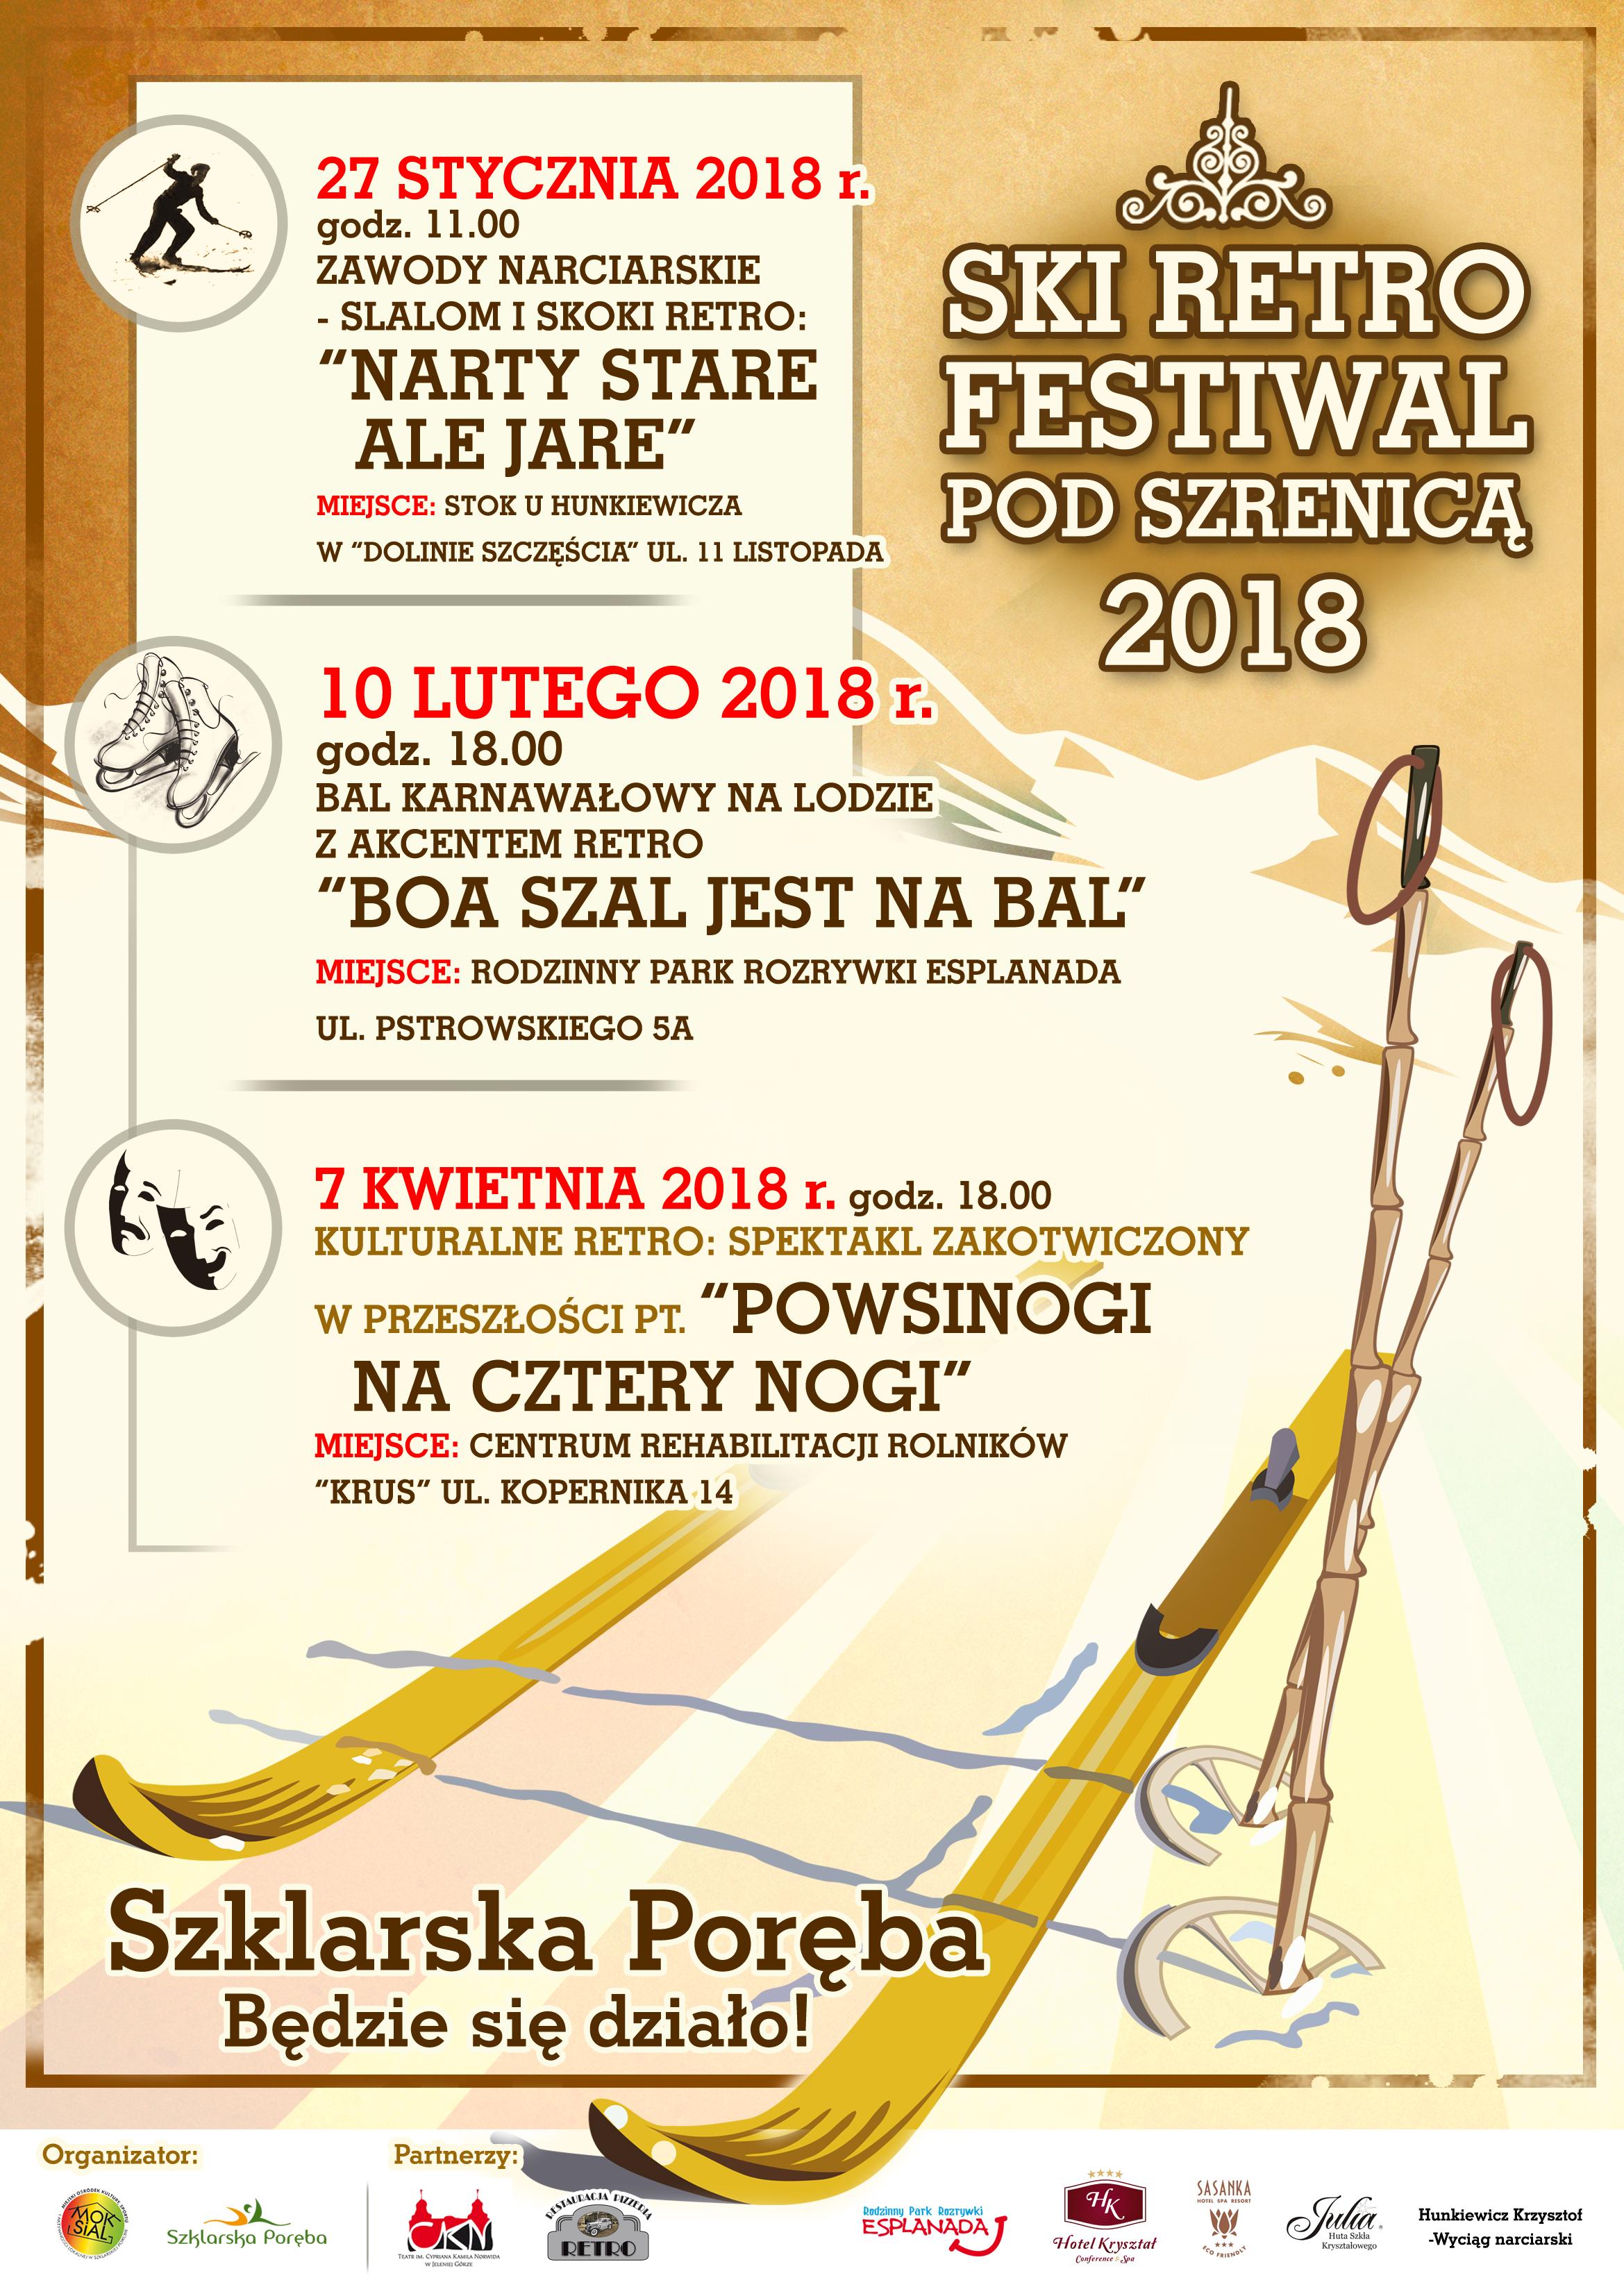 Ski Retro Festiwal pod Szrenicą